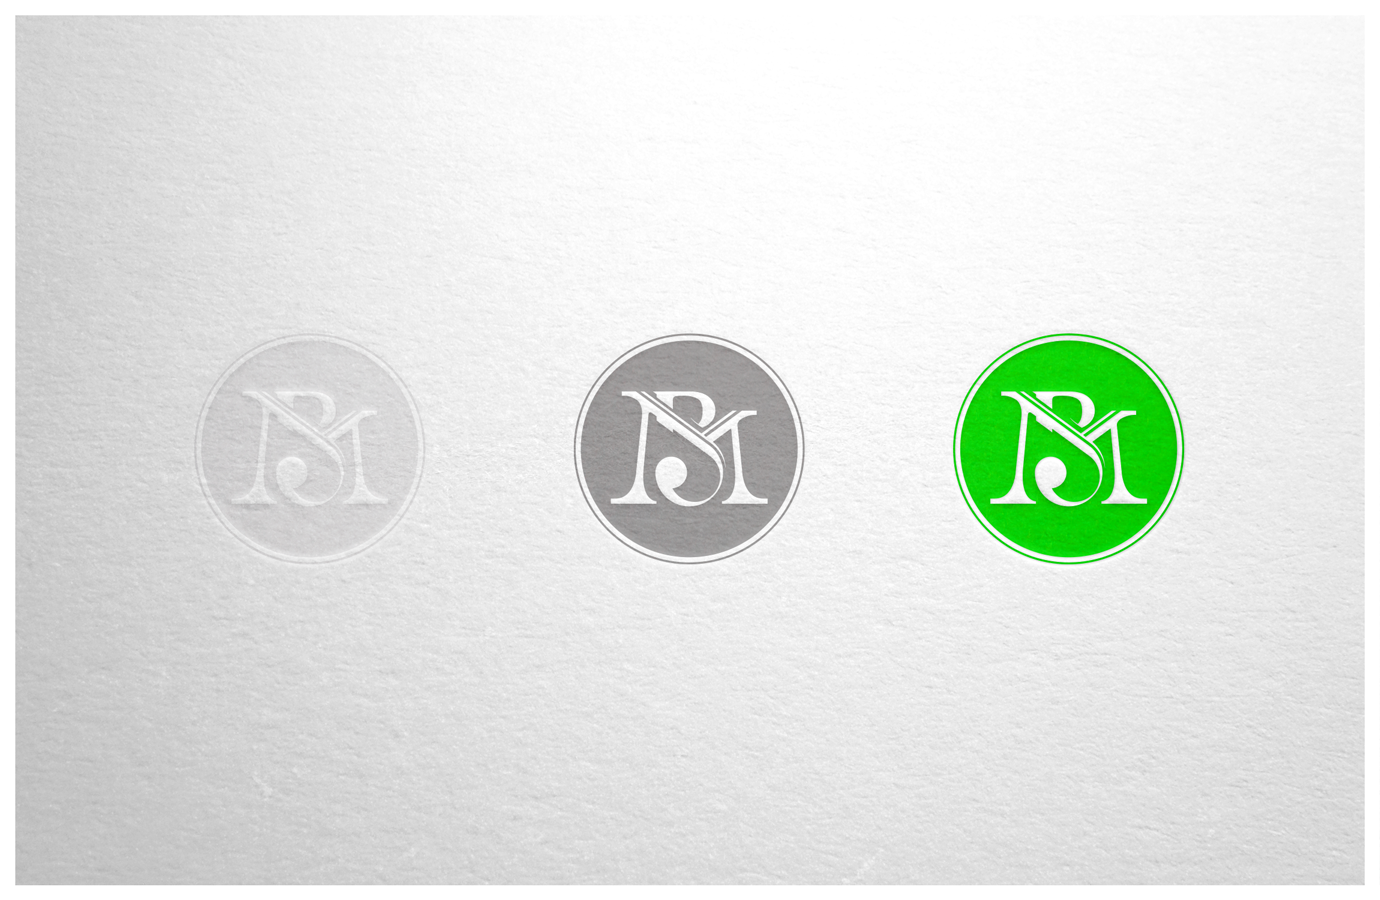 Monogram design in brand colours for Mandy Brannan.